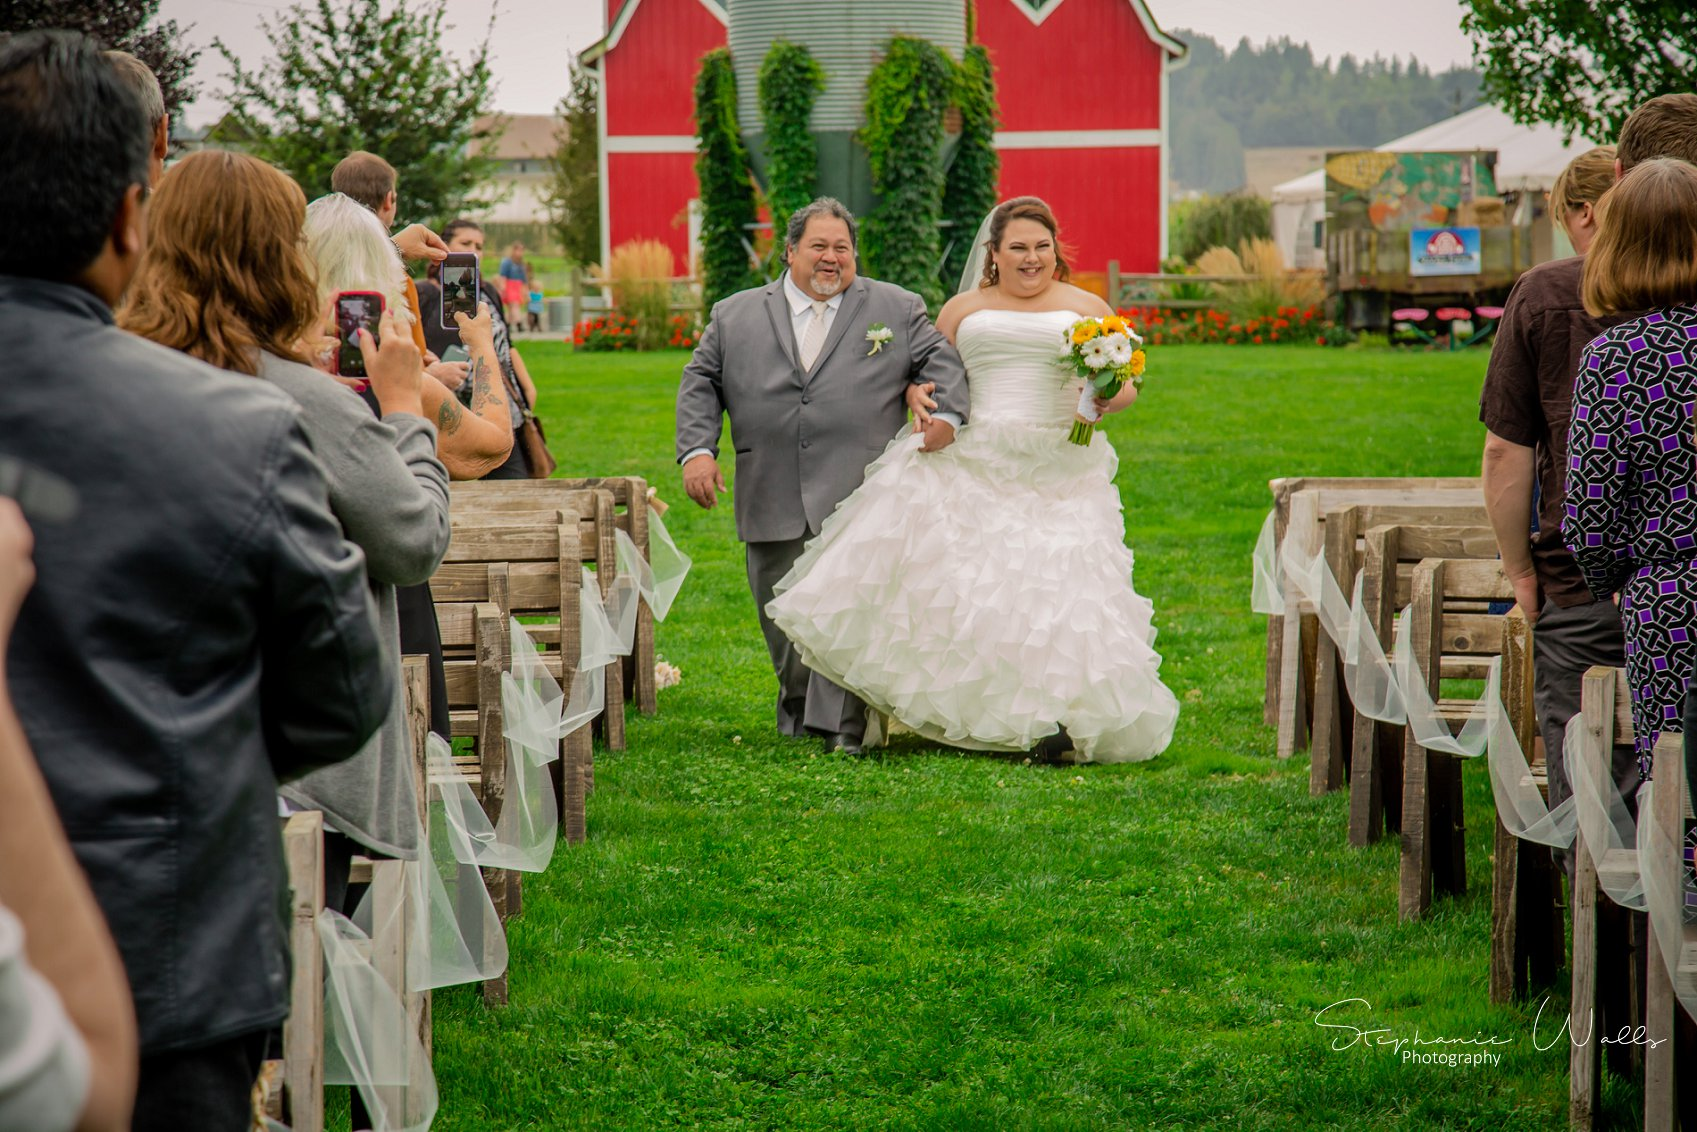 Kimble Wedding 119 1 Marlena & Allans | Snohomish Red Barn Events (Stocker Farms) | Snohomish, Wa Wedding Photographer